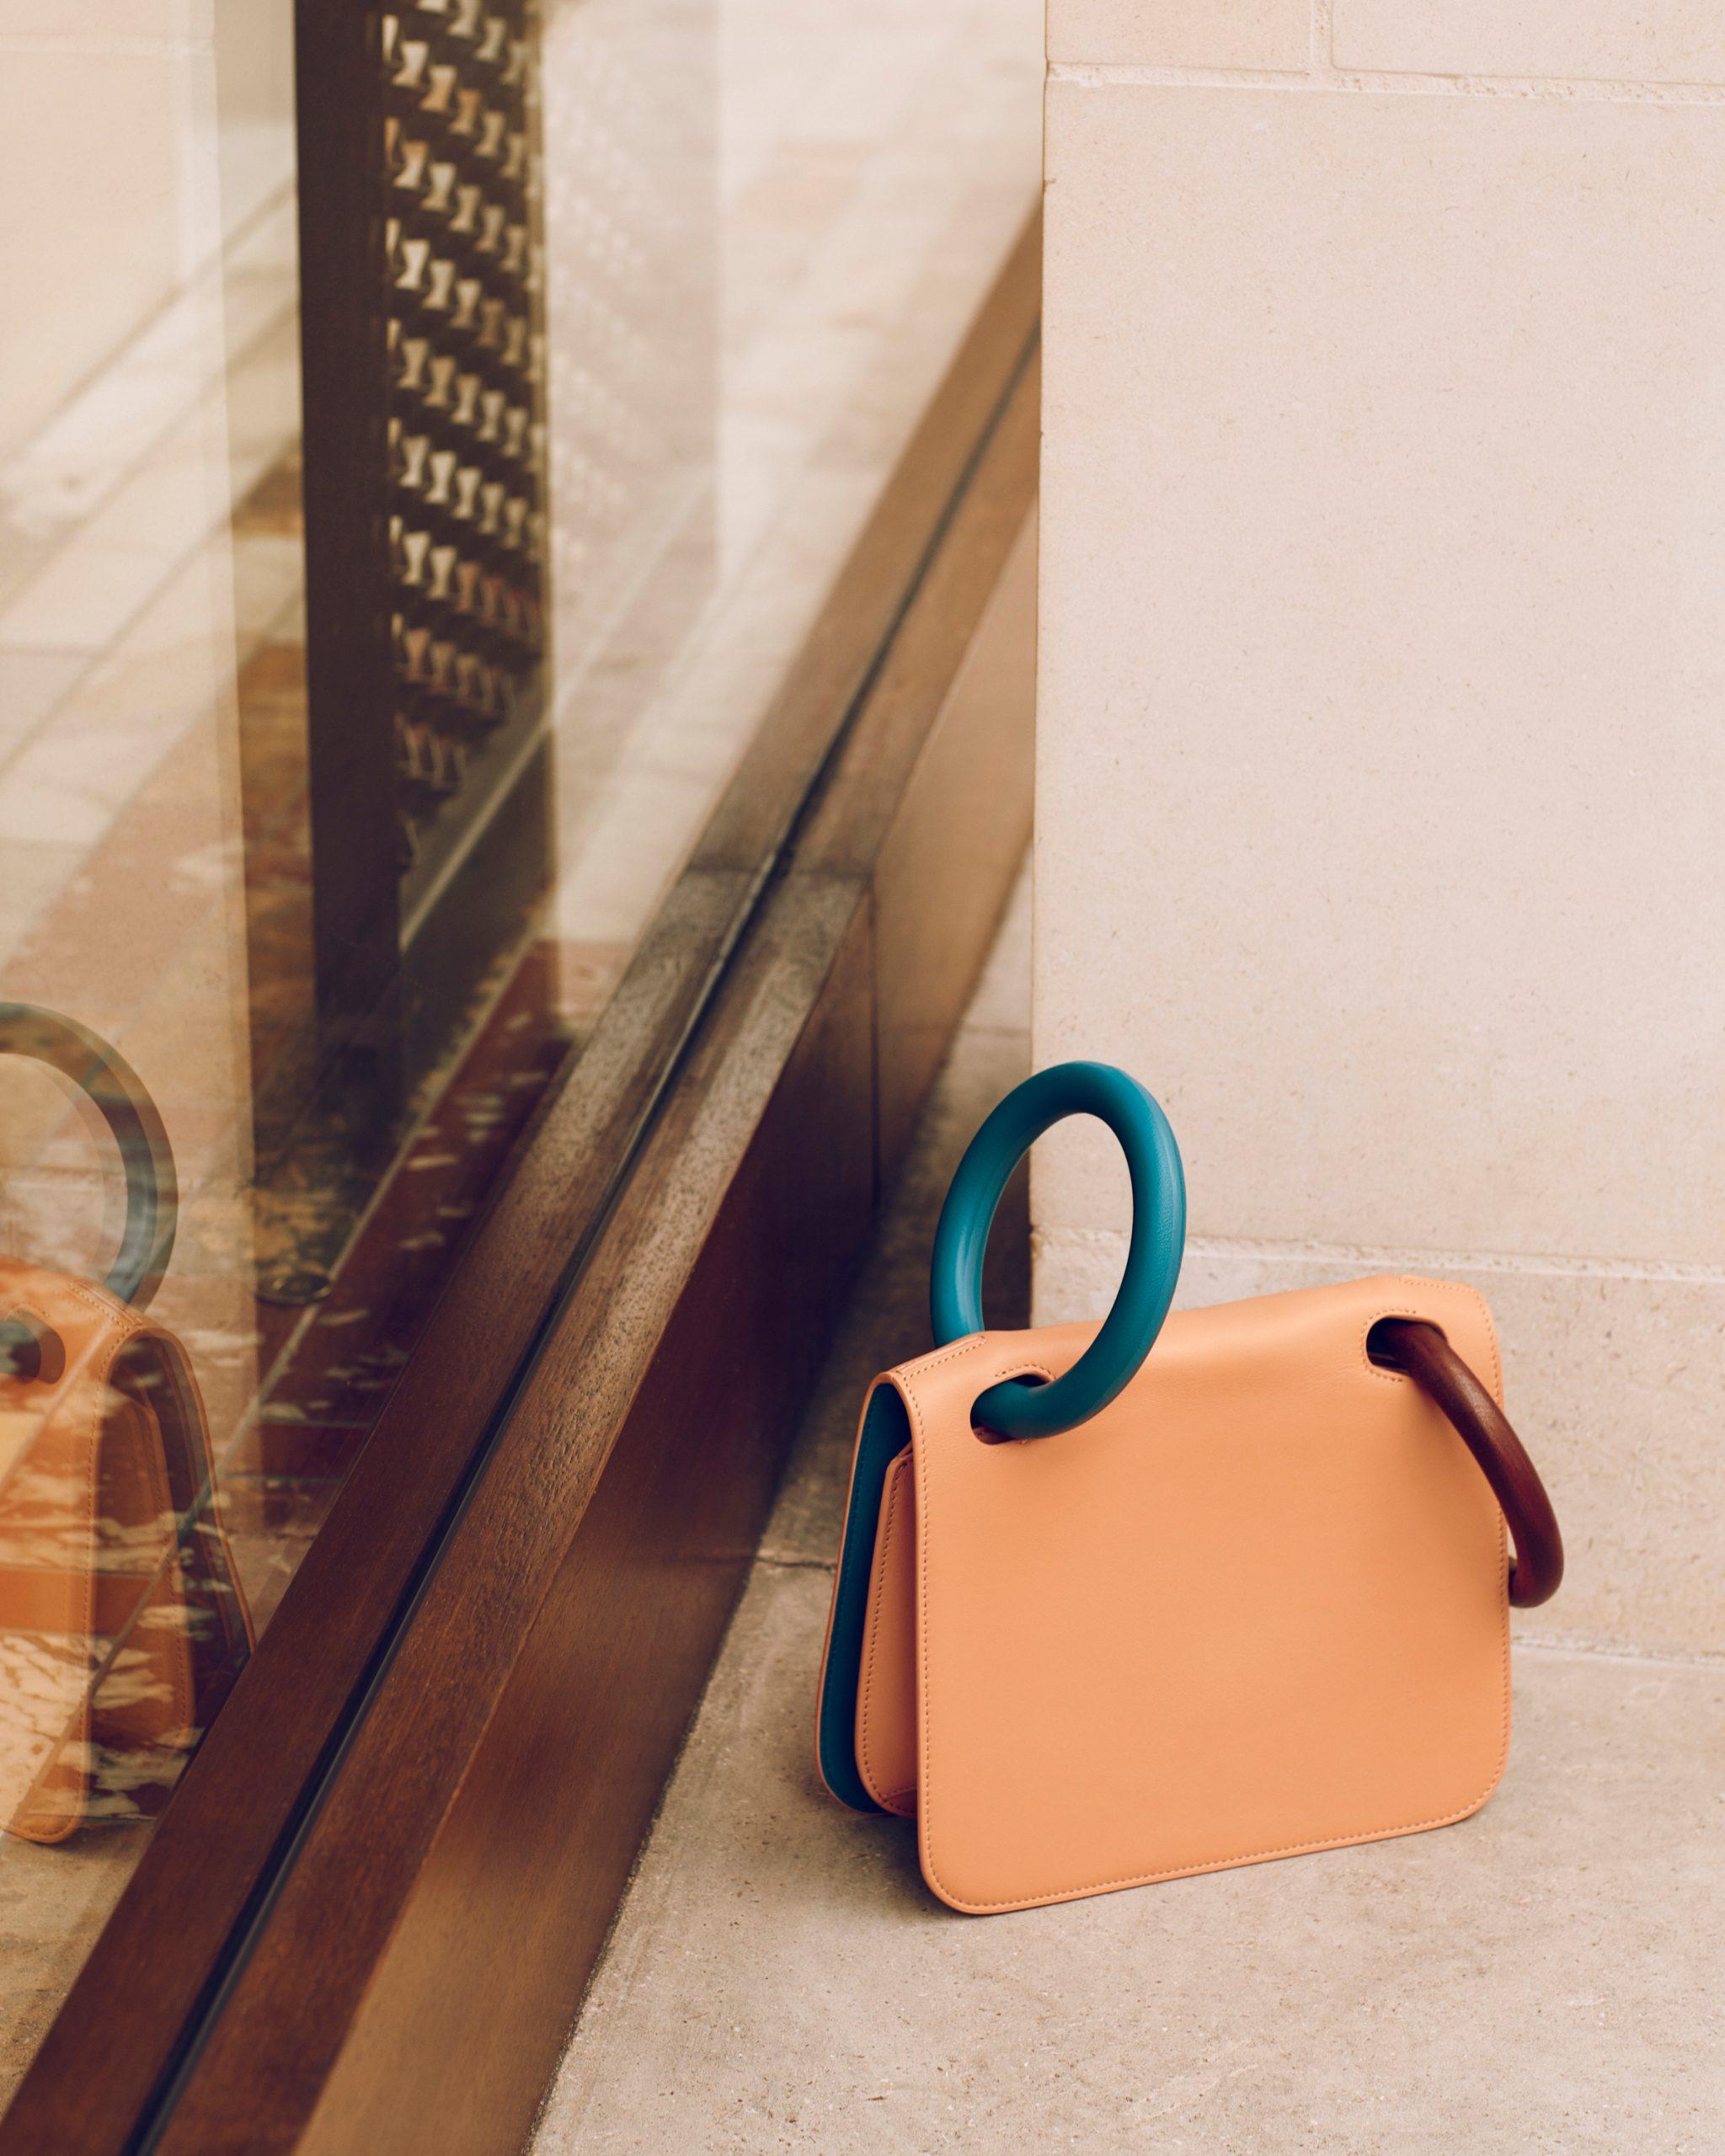 fashion still life of bag